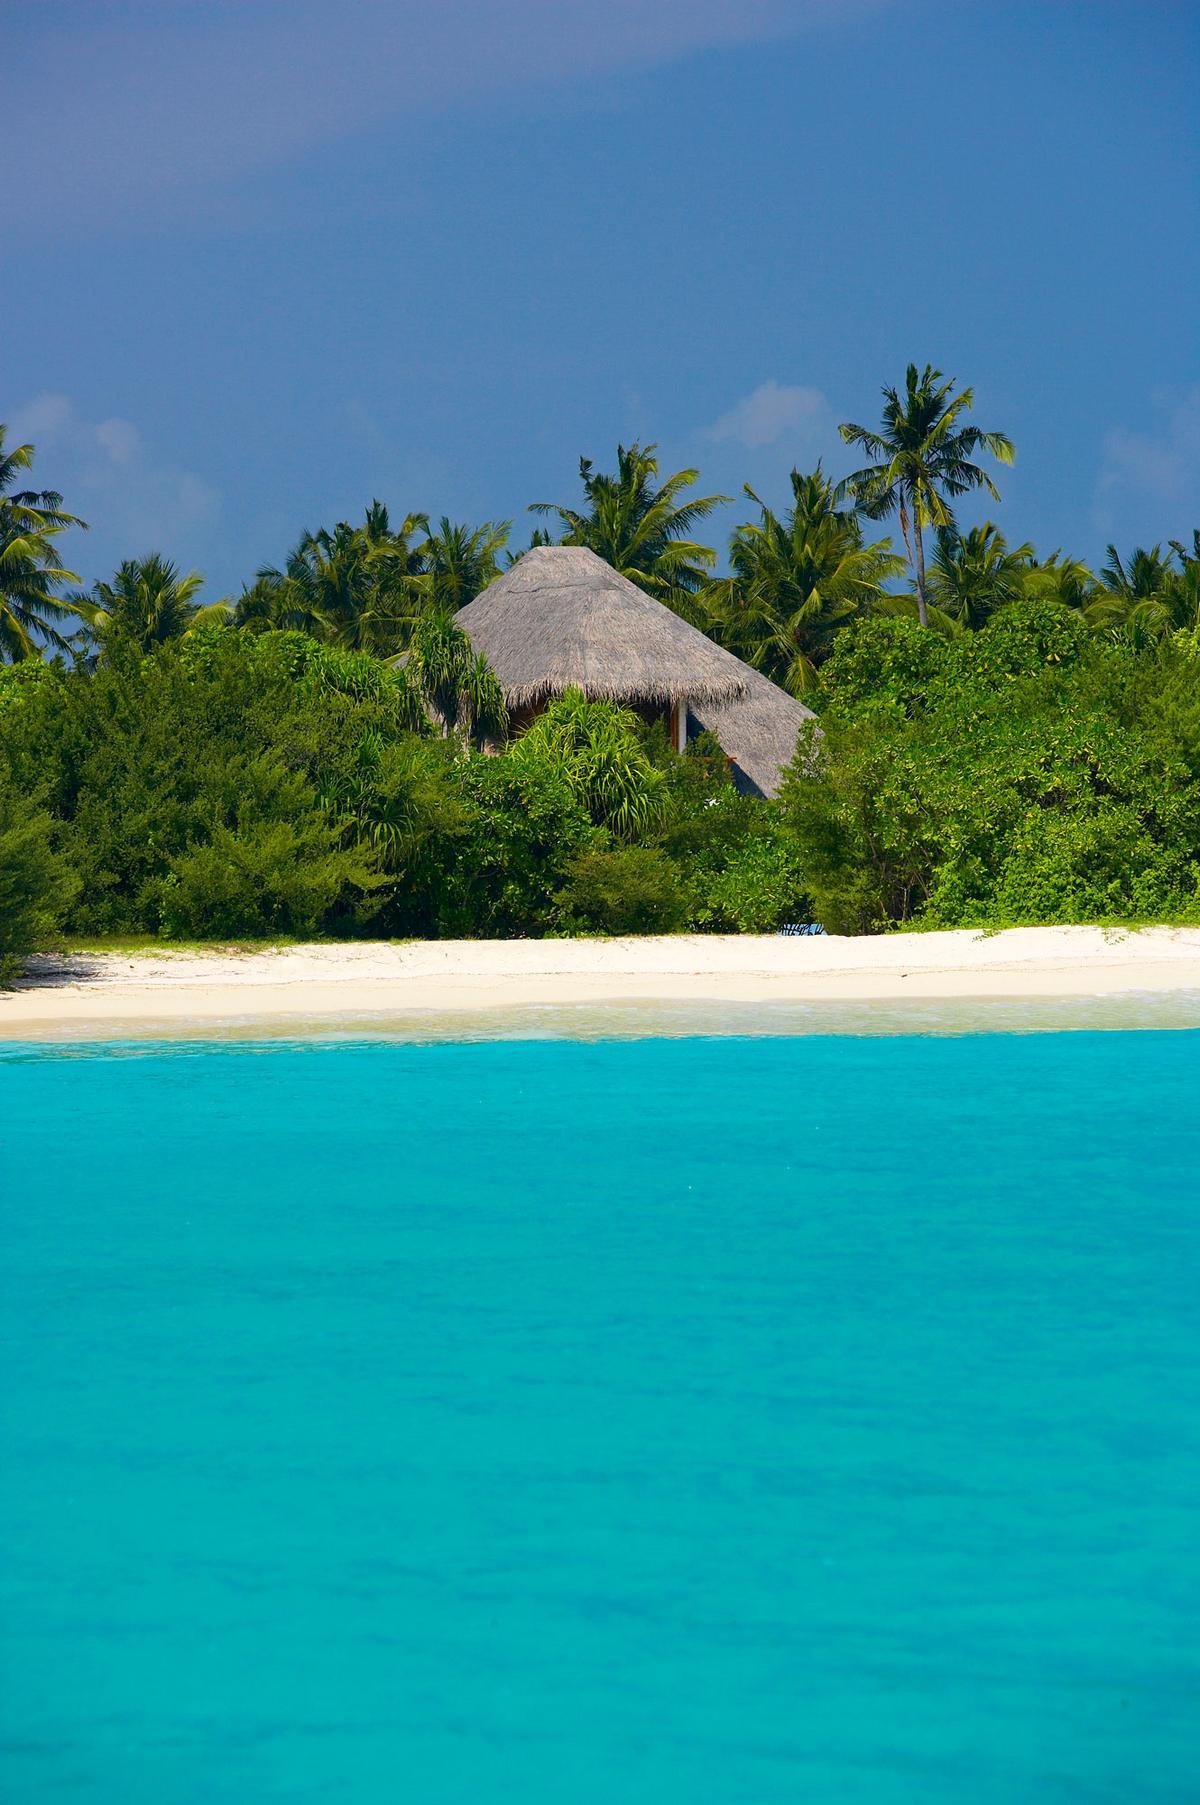 Island Hideaway at Dhonakulhi Maldives Spa Resort & Marina, Island Hideaway, отель на Мальдивах, отель для молодоженов, лучшие отели мира